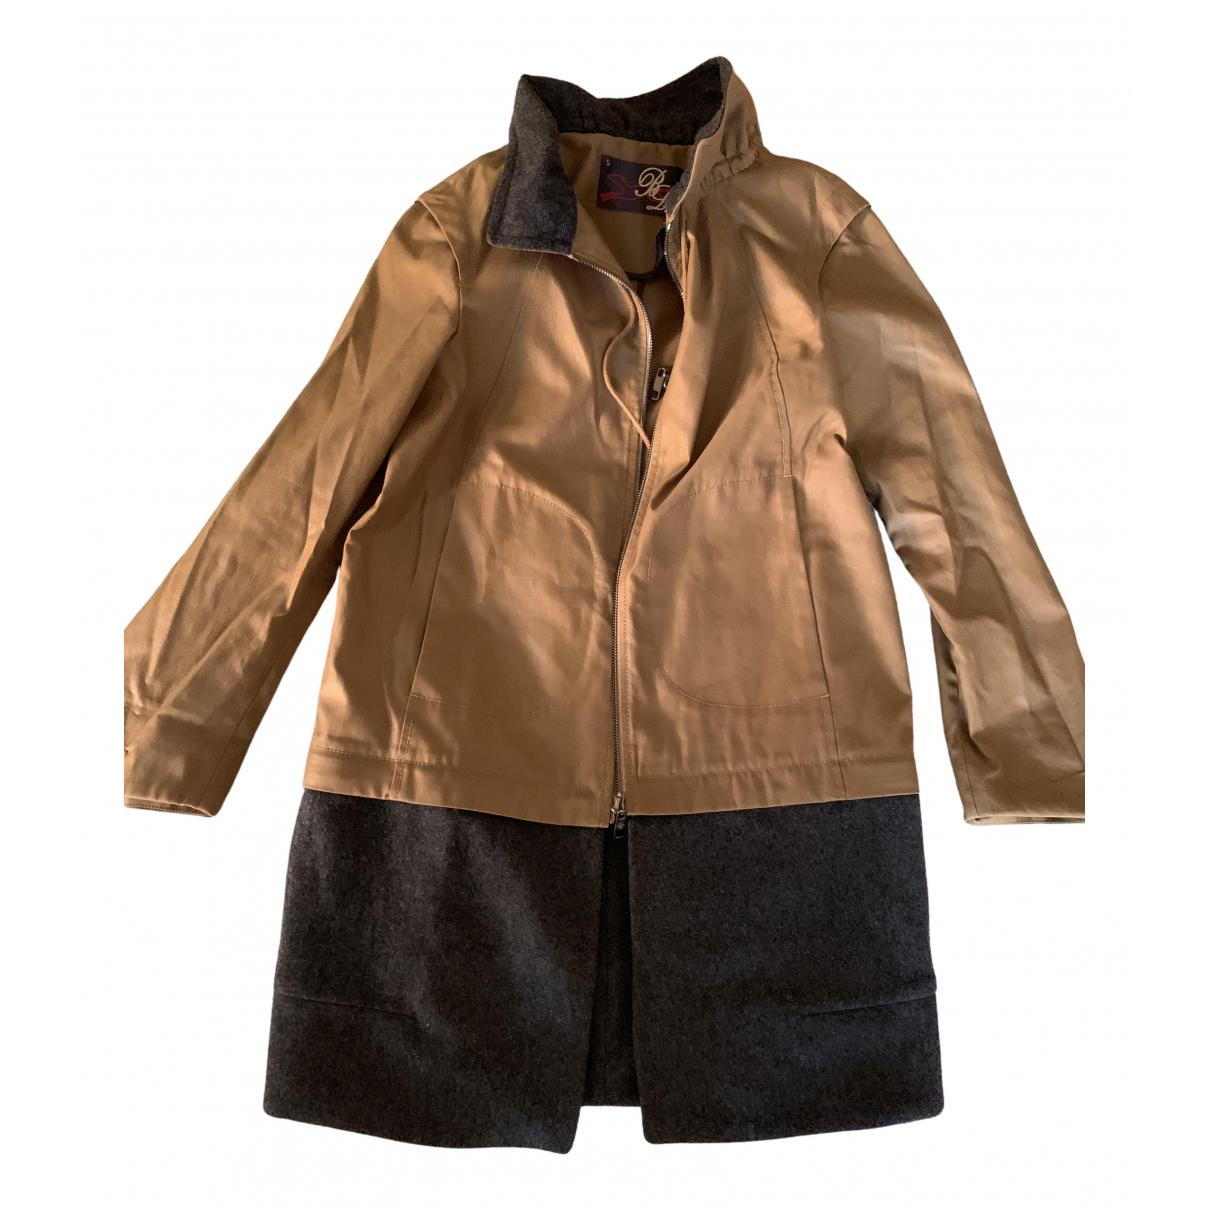 Bimba Y Lola \N Brown Trench coat for Women S International